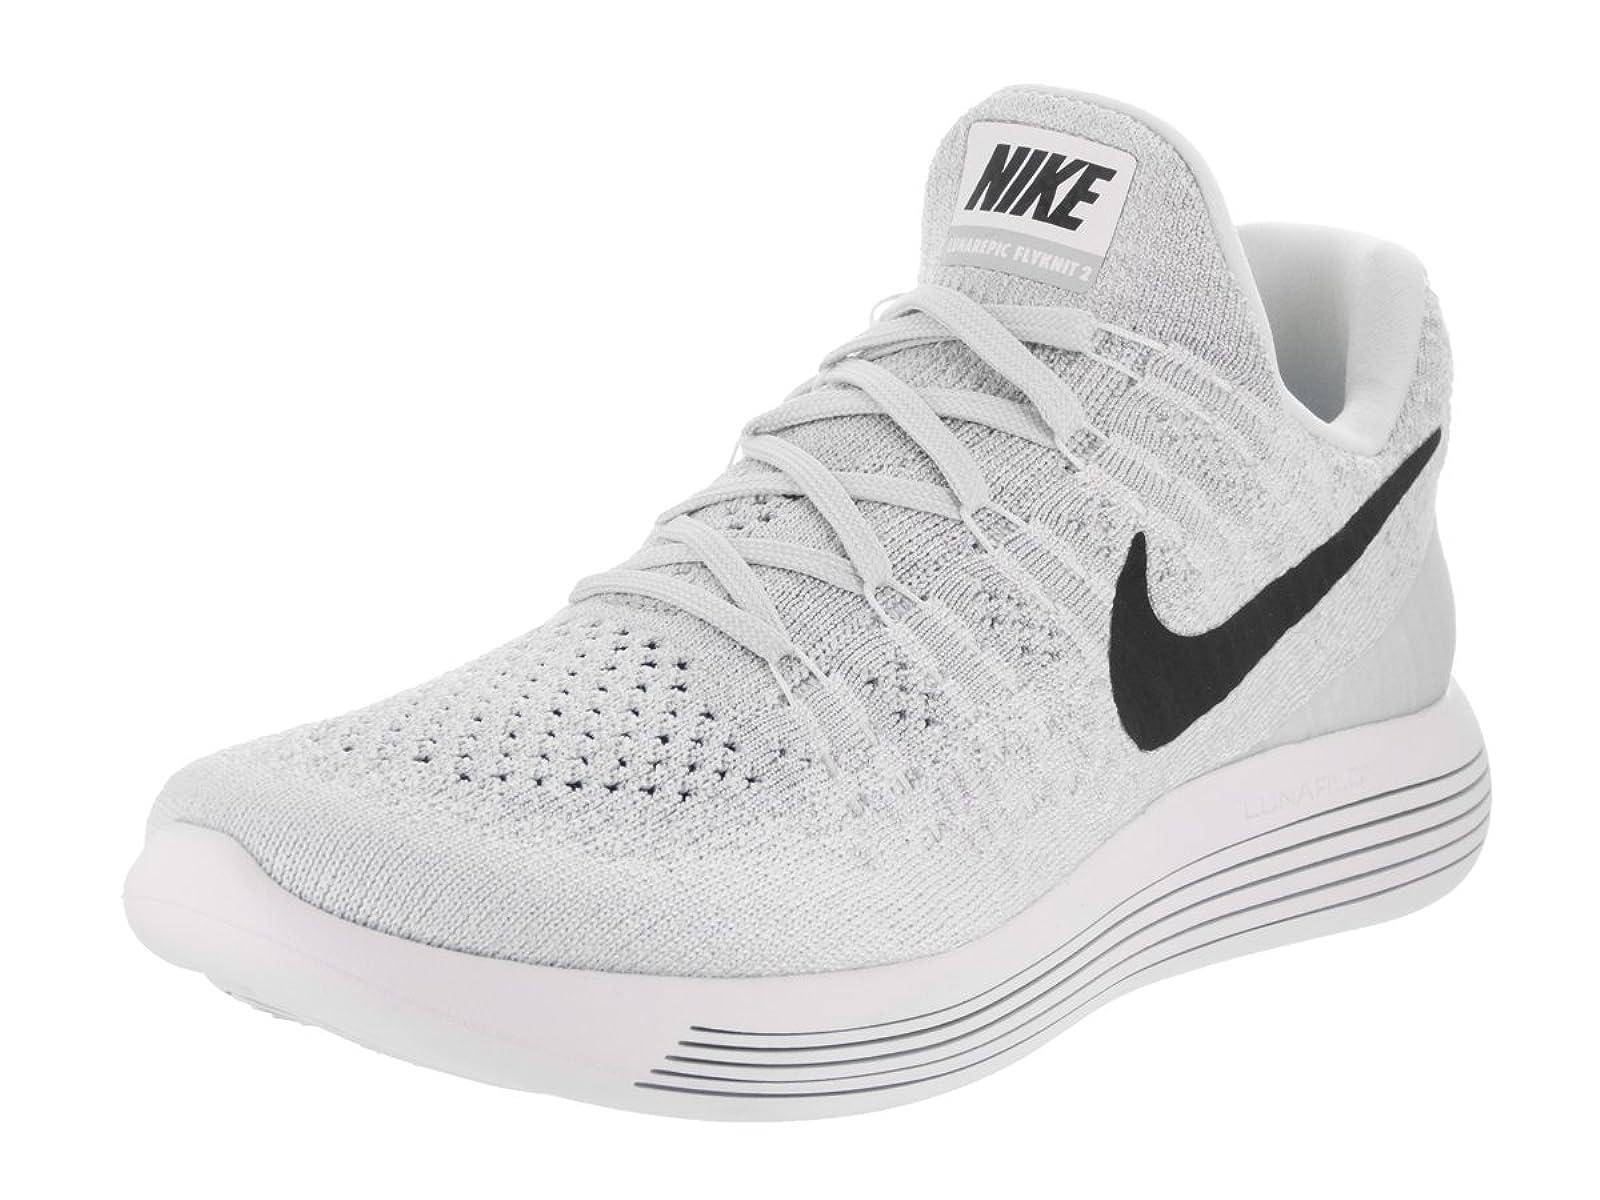 Nike Womens Lunarepic Low Flyknit 2 White/ Variation - 1